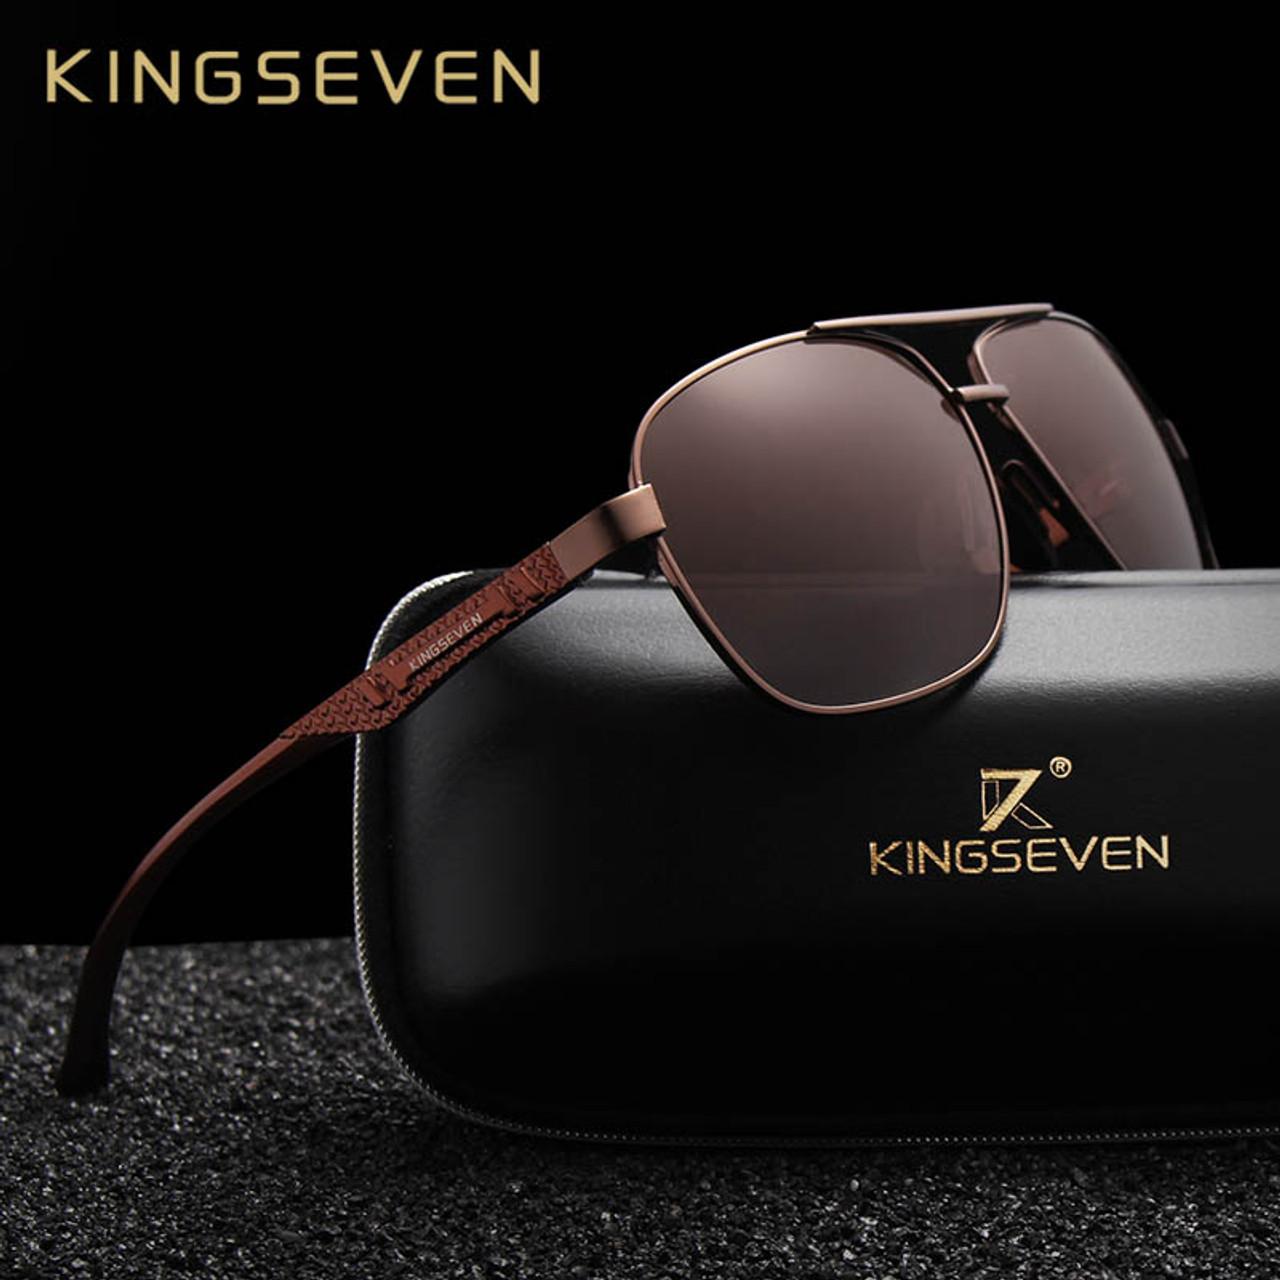 9a3a6ba622805 KINGSEVEN 2018 Brand Men Aluminum Sunglasses HD Polarized UV400 Mirror Male  Sun Glasses Women For Men Oculos de sol - OnshopDeals.Com